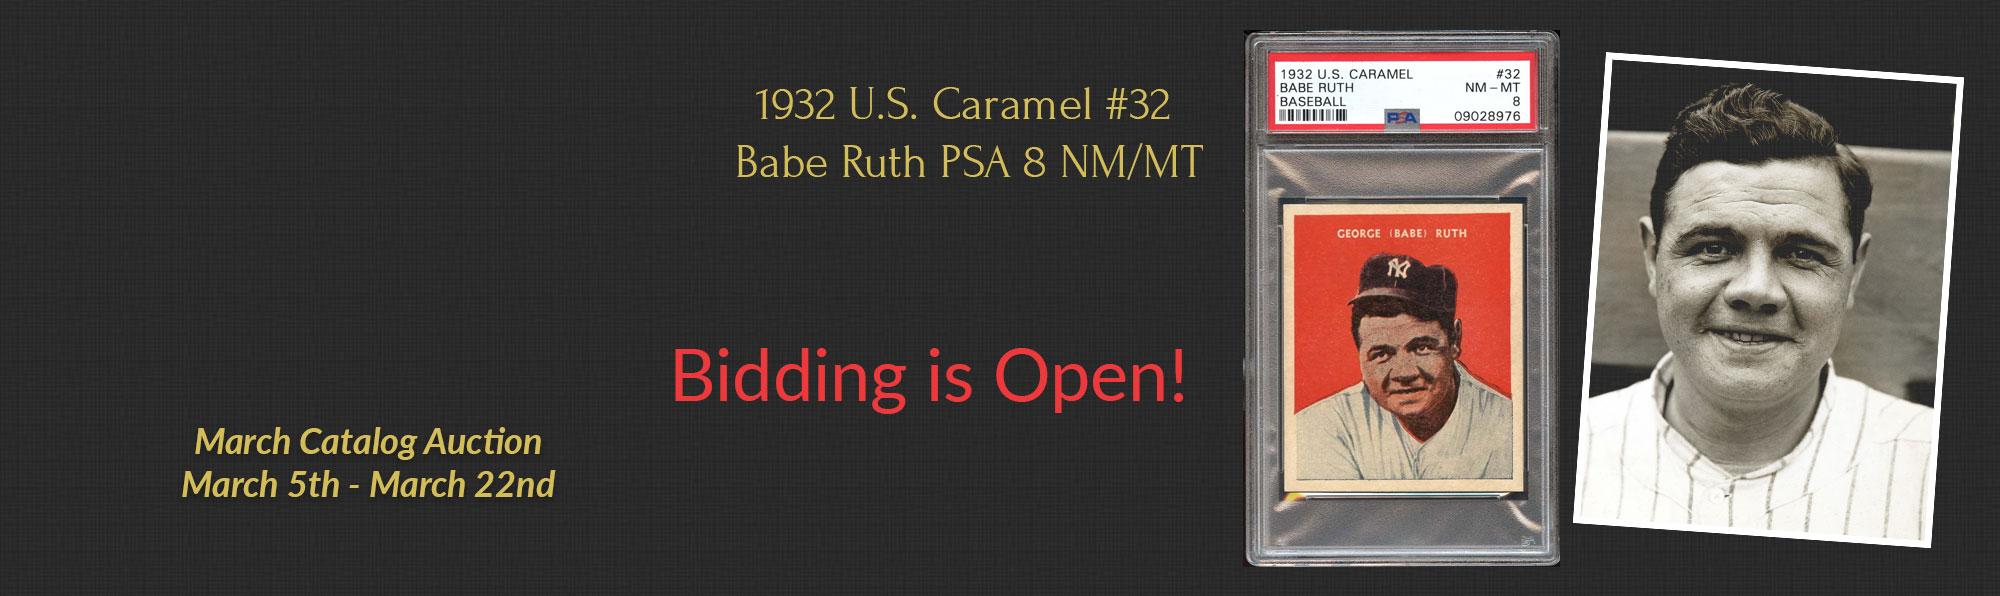 U.S. Caramel Babe Ruth